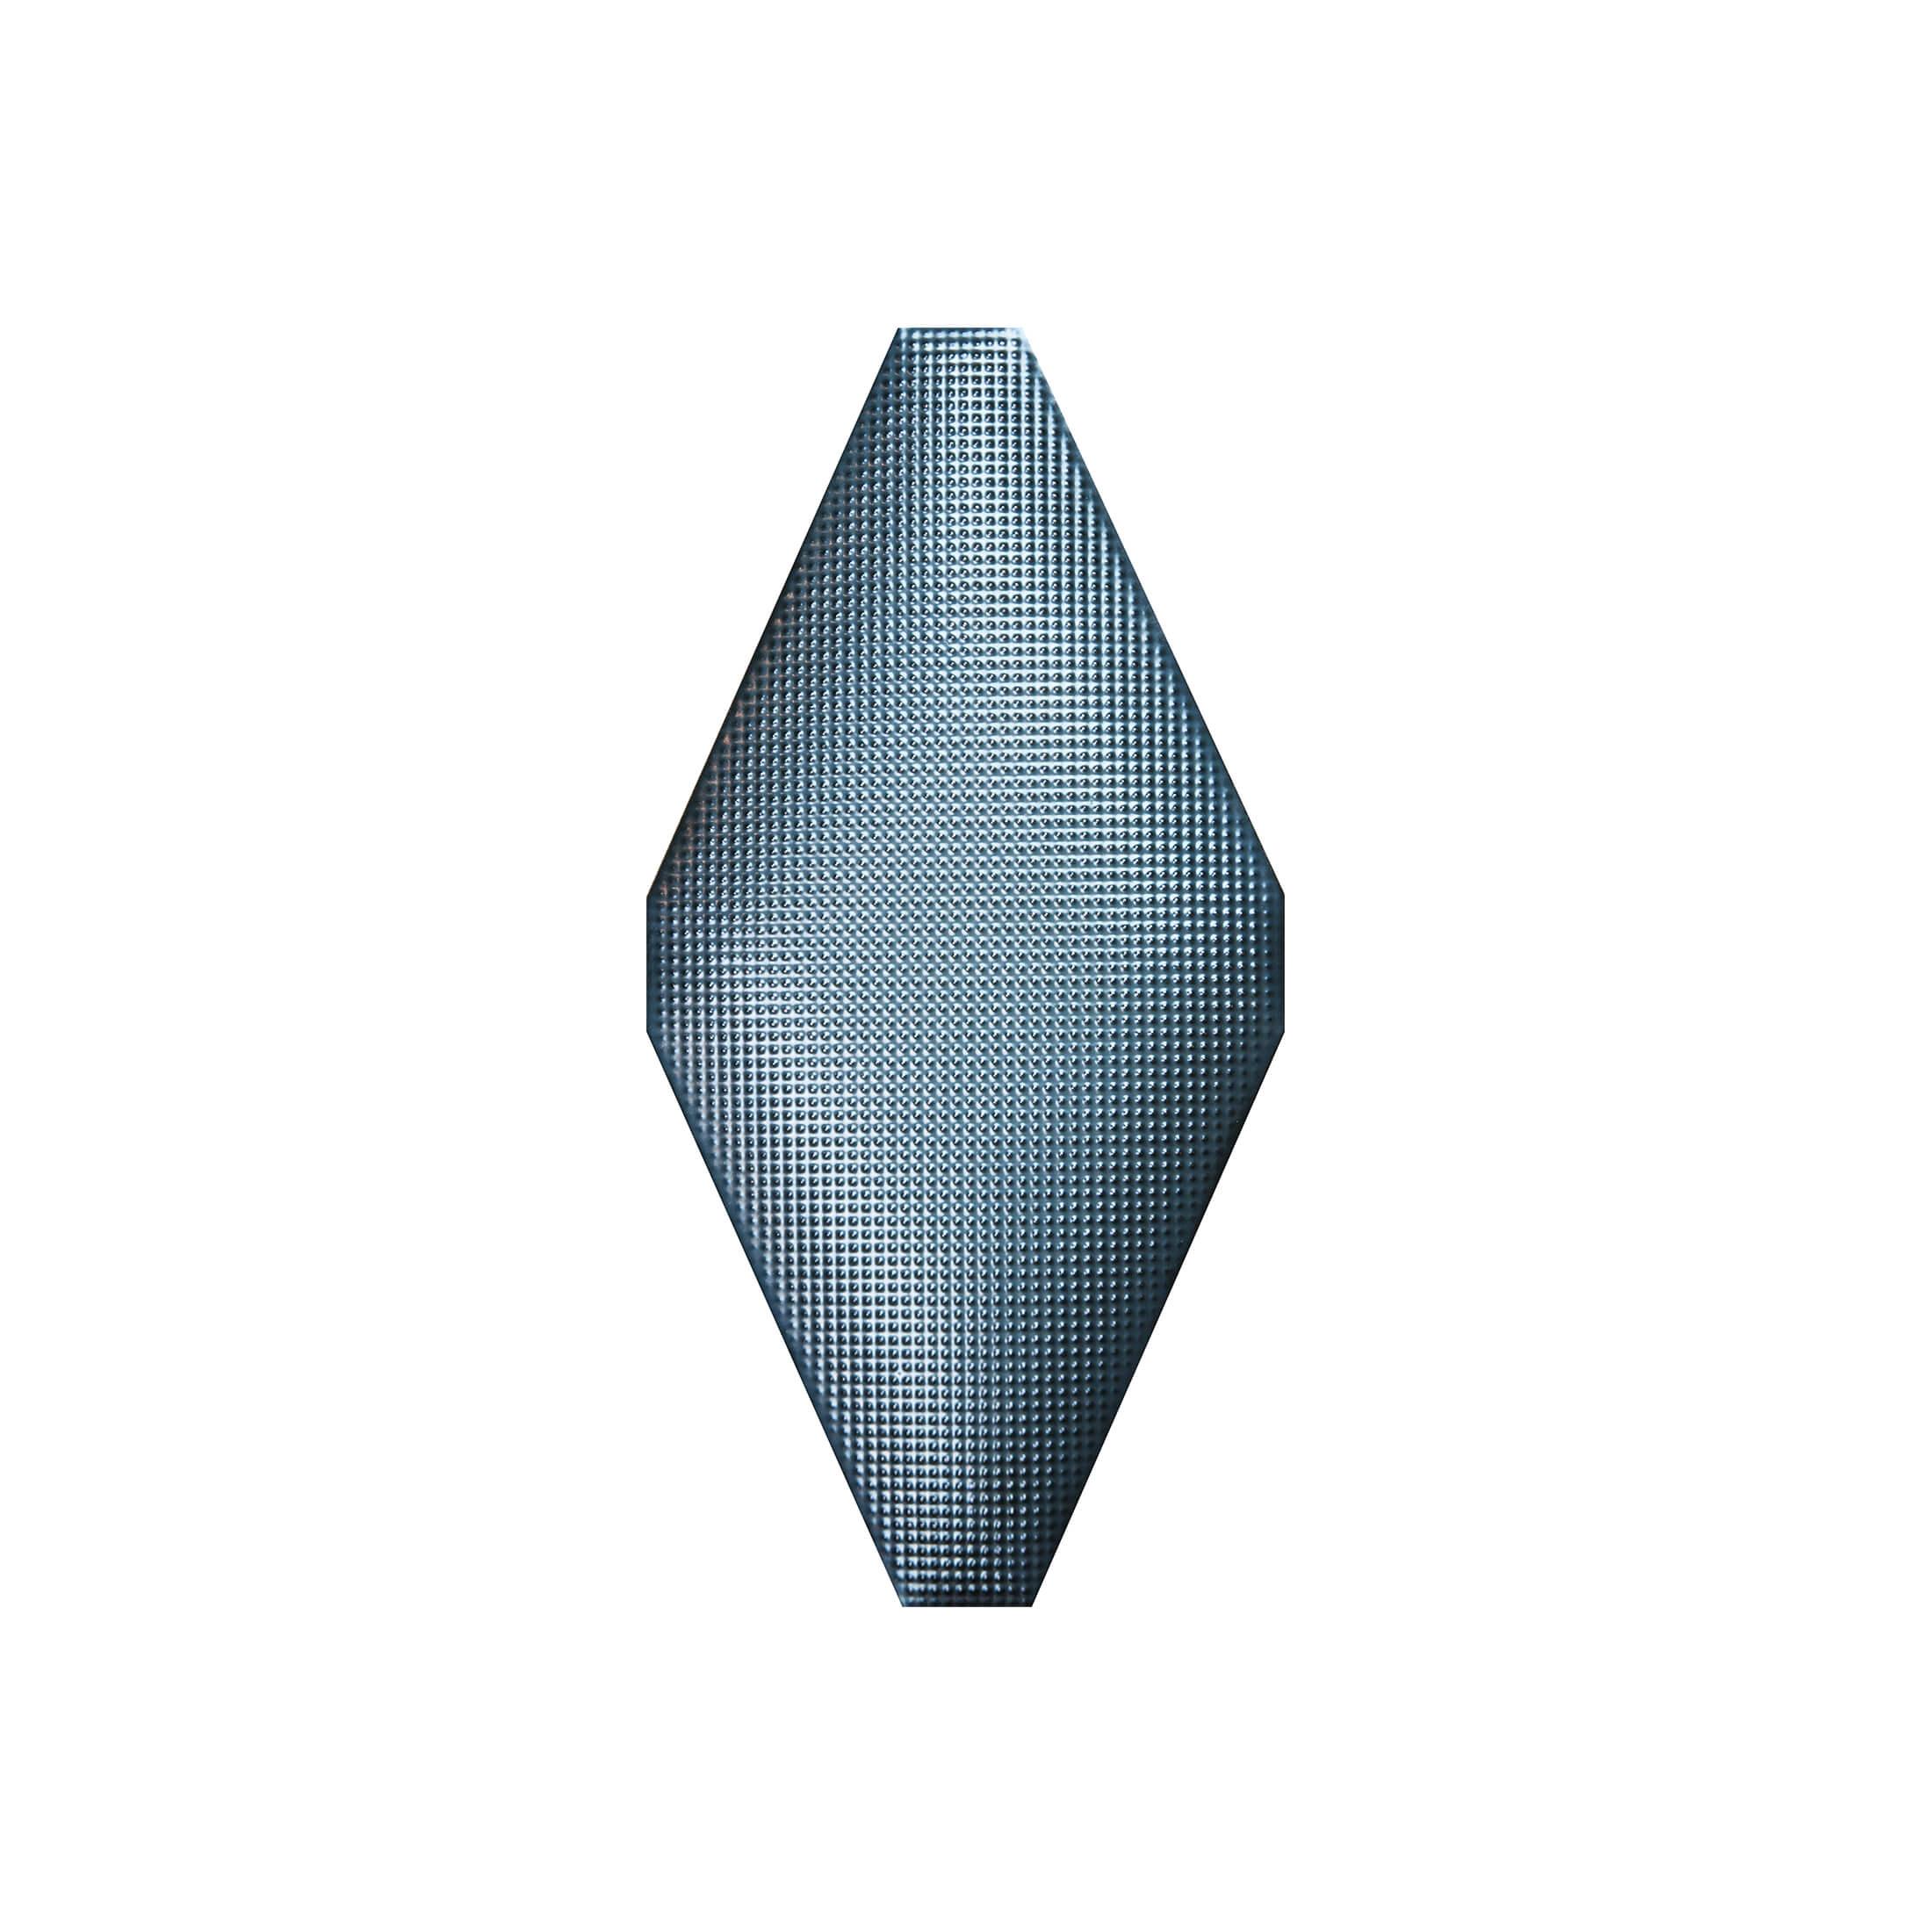 ADNE8123 - ROMBO ACOLCHADO NIQUEL - 10 cm X 20 cm